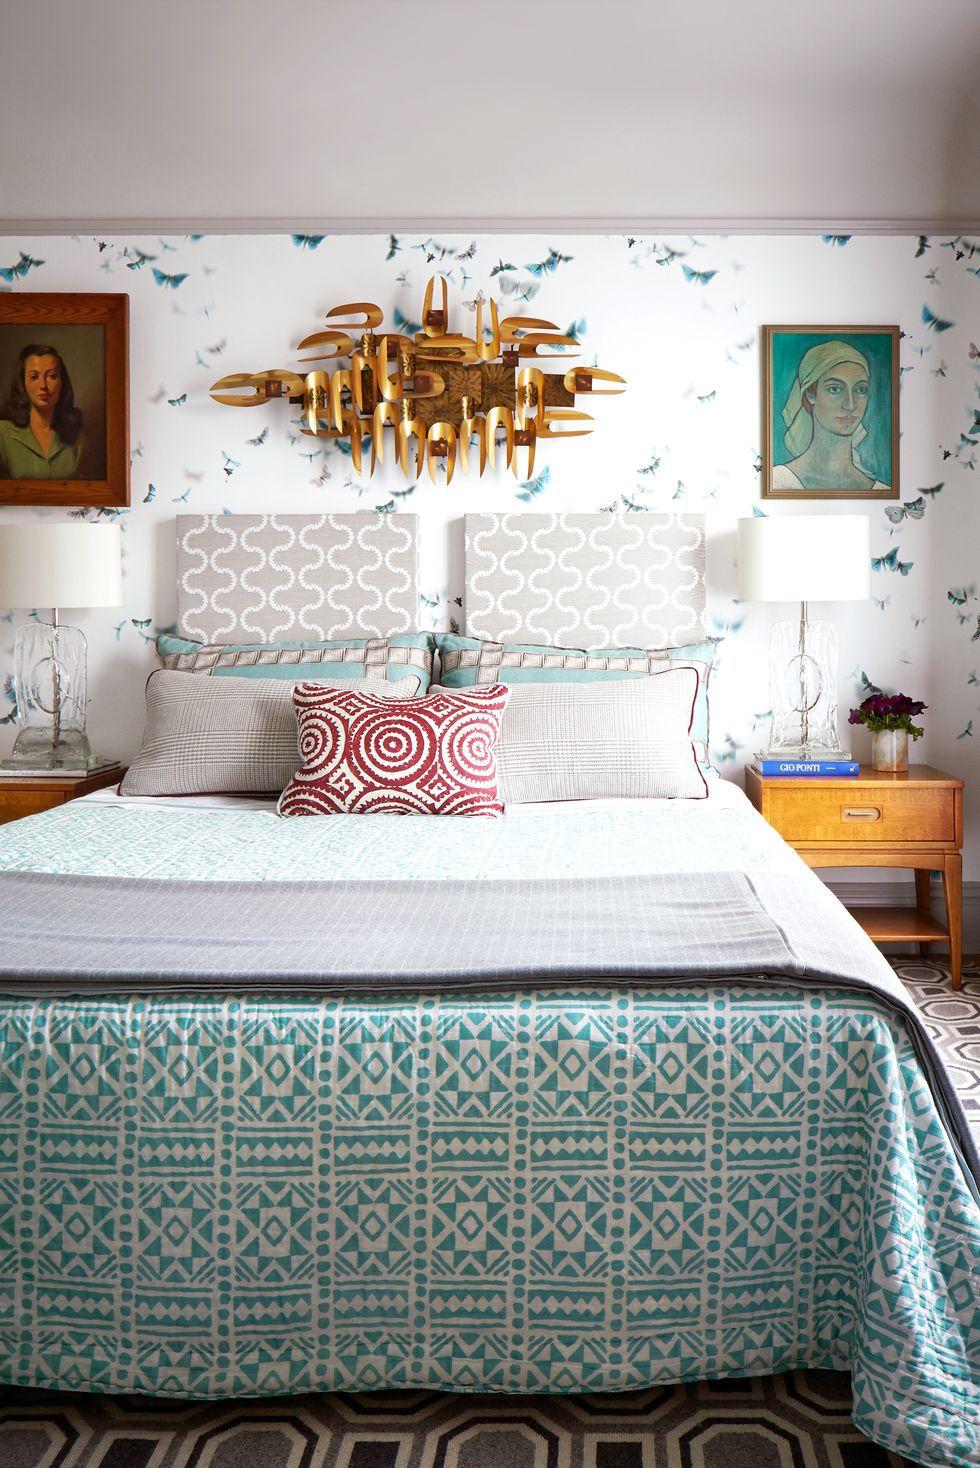 19 Best Bedroom Wall Decor Ideas in 2020 - Bedroom Wall ... on Bedroom Wall Decor  id=26813